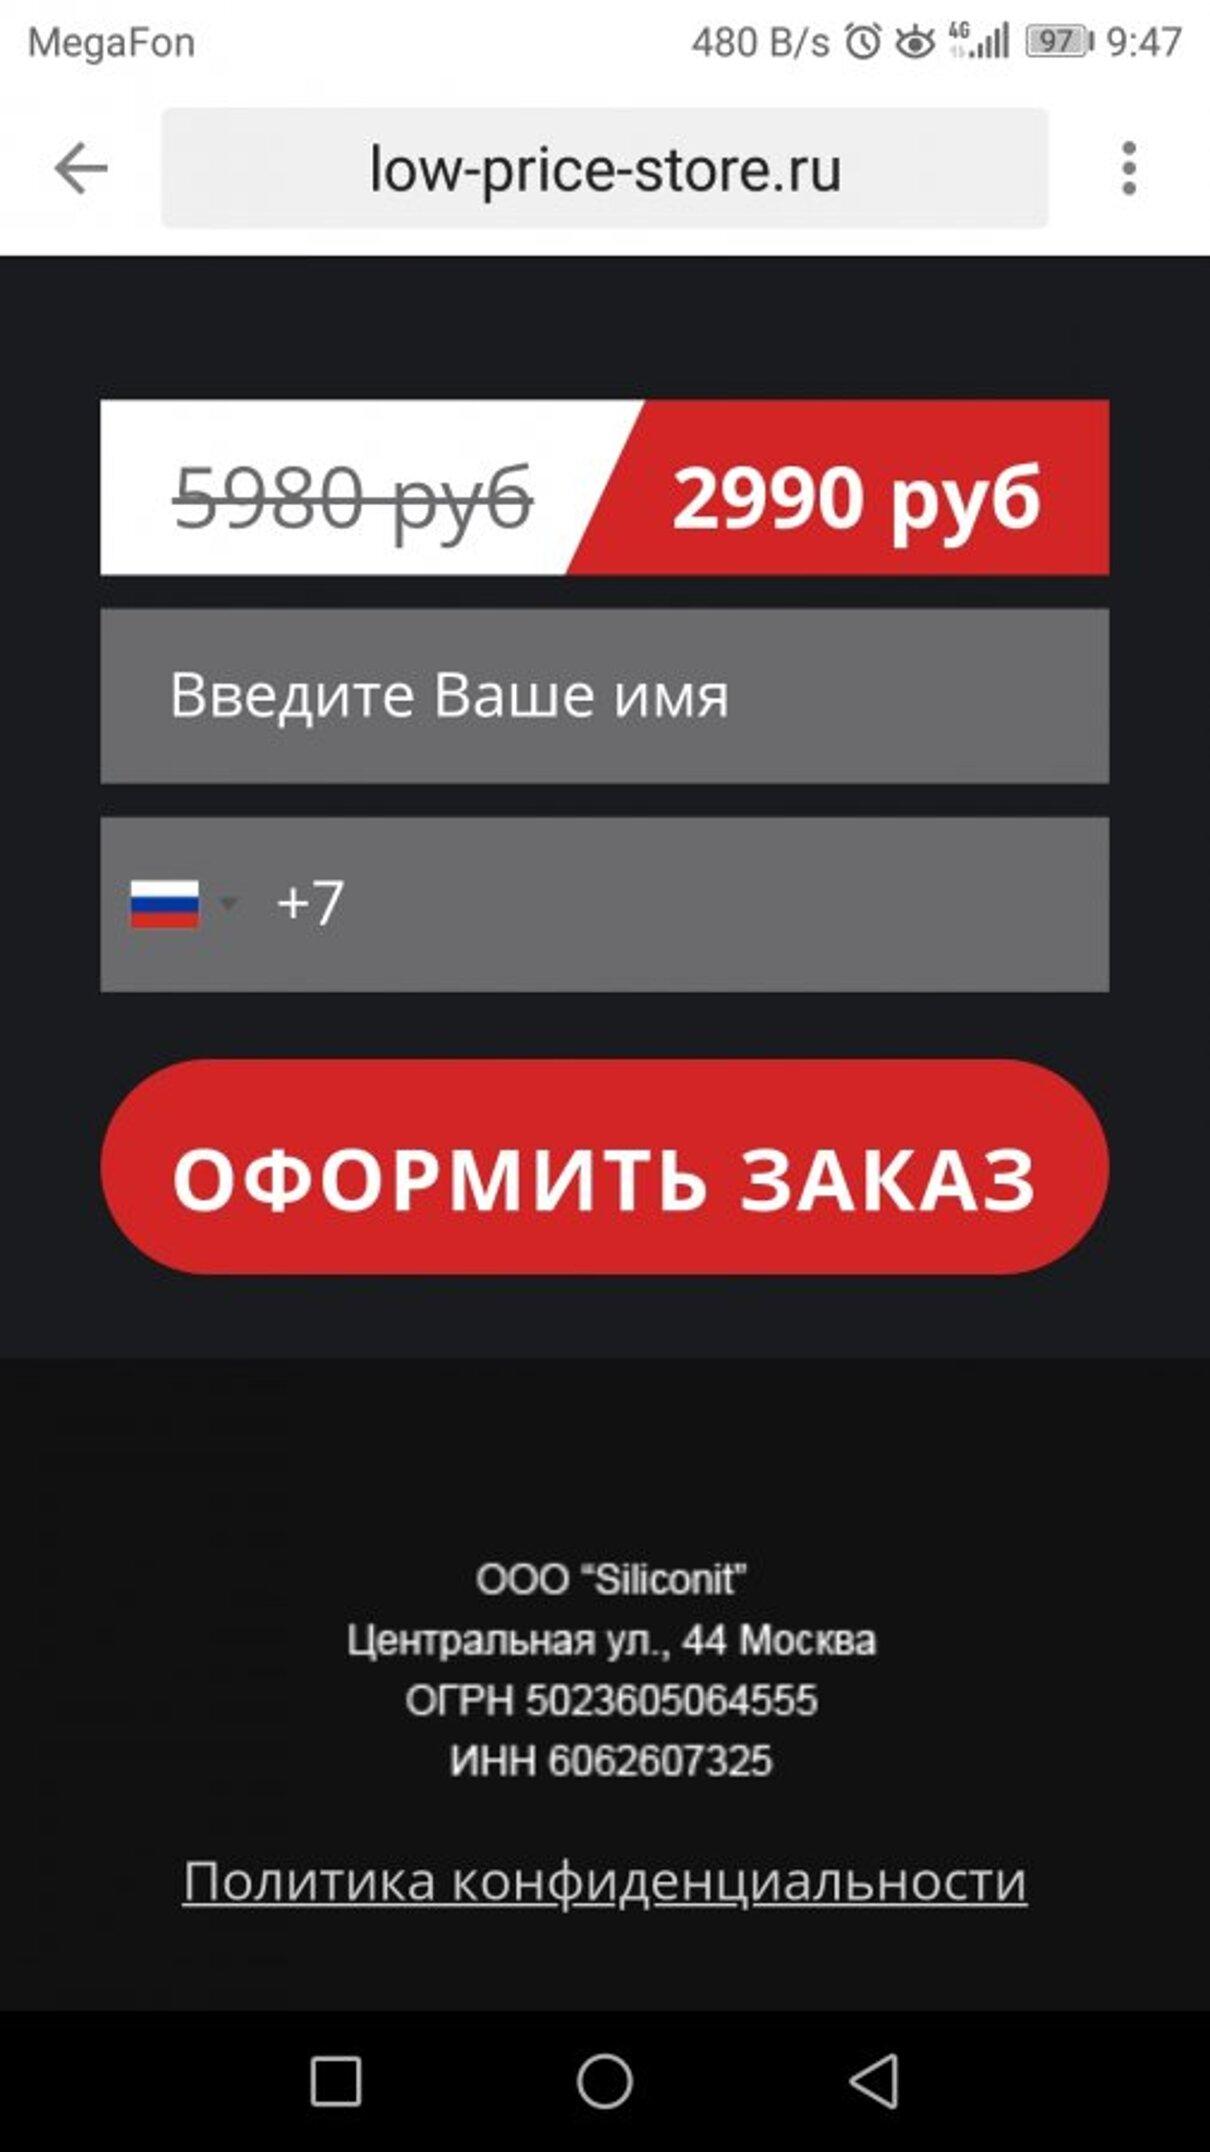 Жалоба-отзыв: Tvshop.shop@yandex.ru - Автомагнитолы Pioneer.  Фото №2